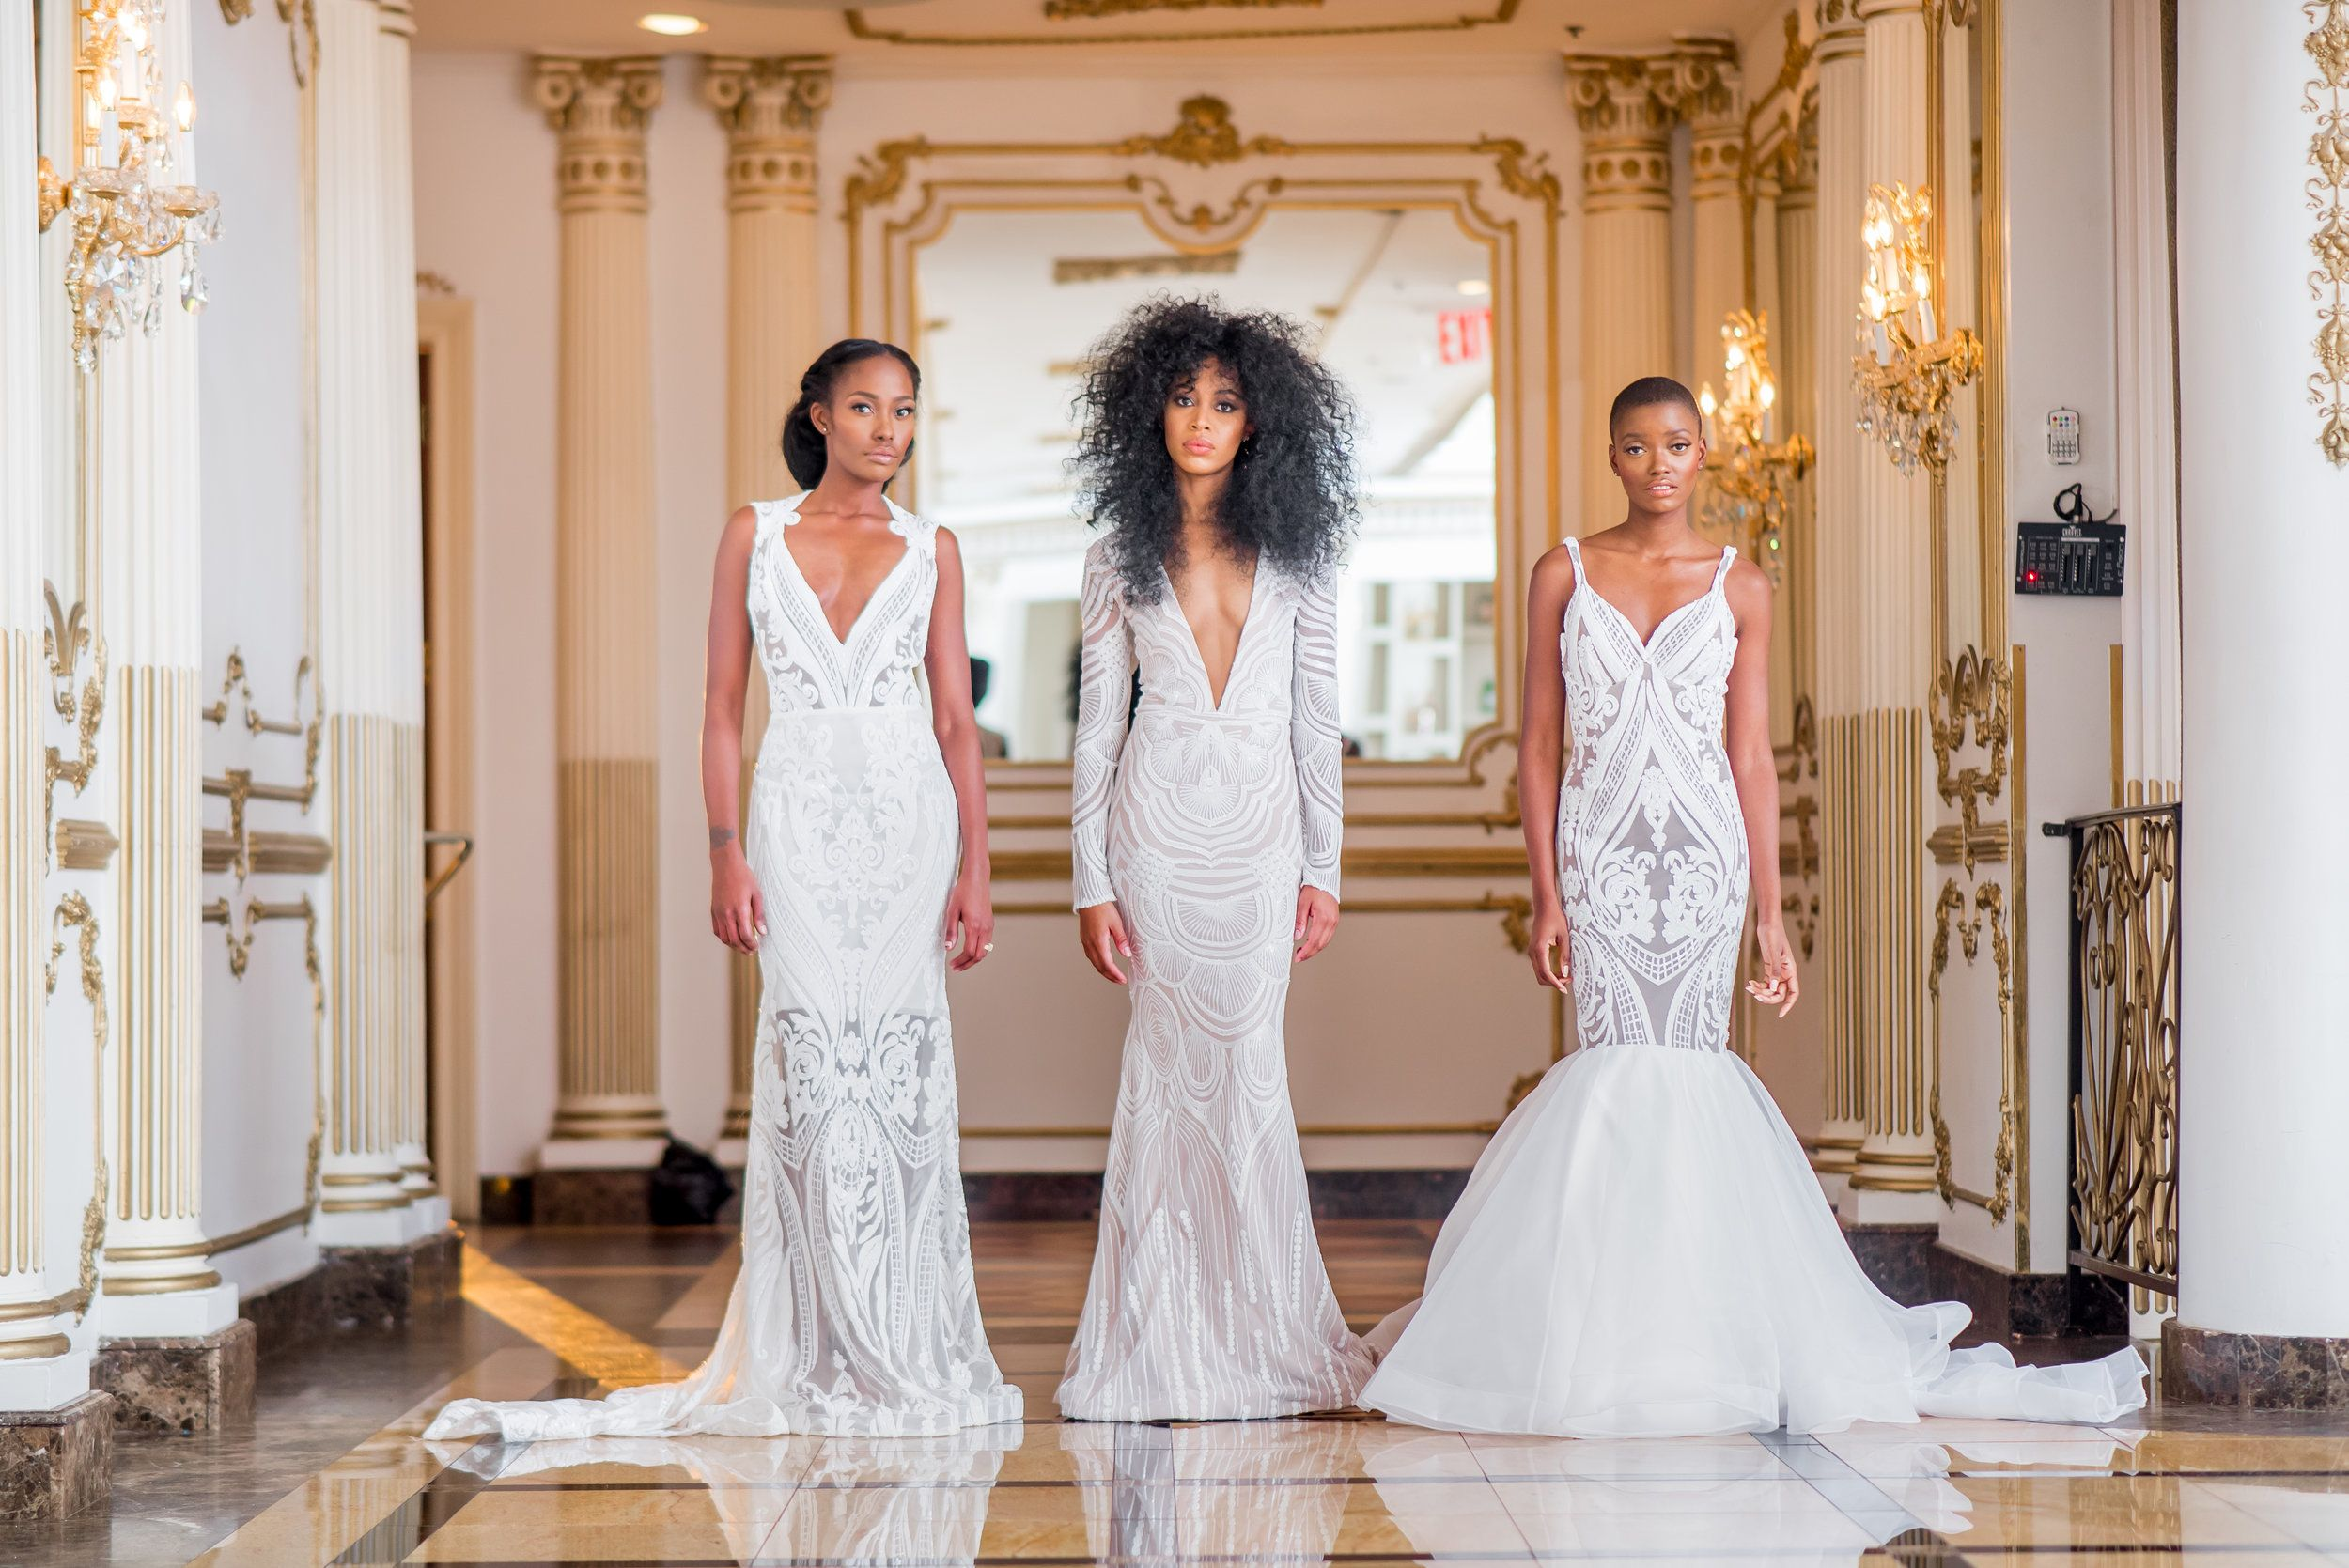 black wedding dress designers to wear on the big day chic